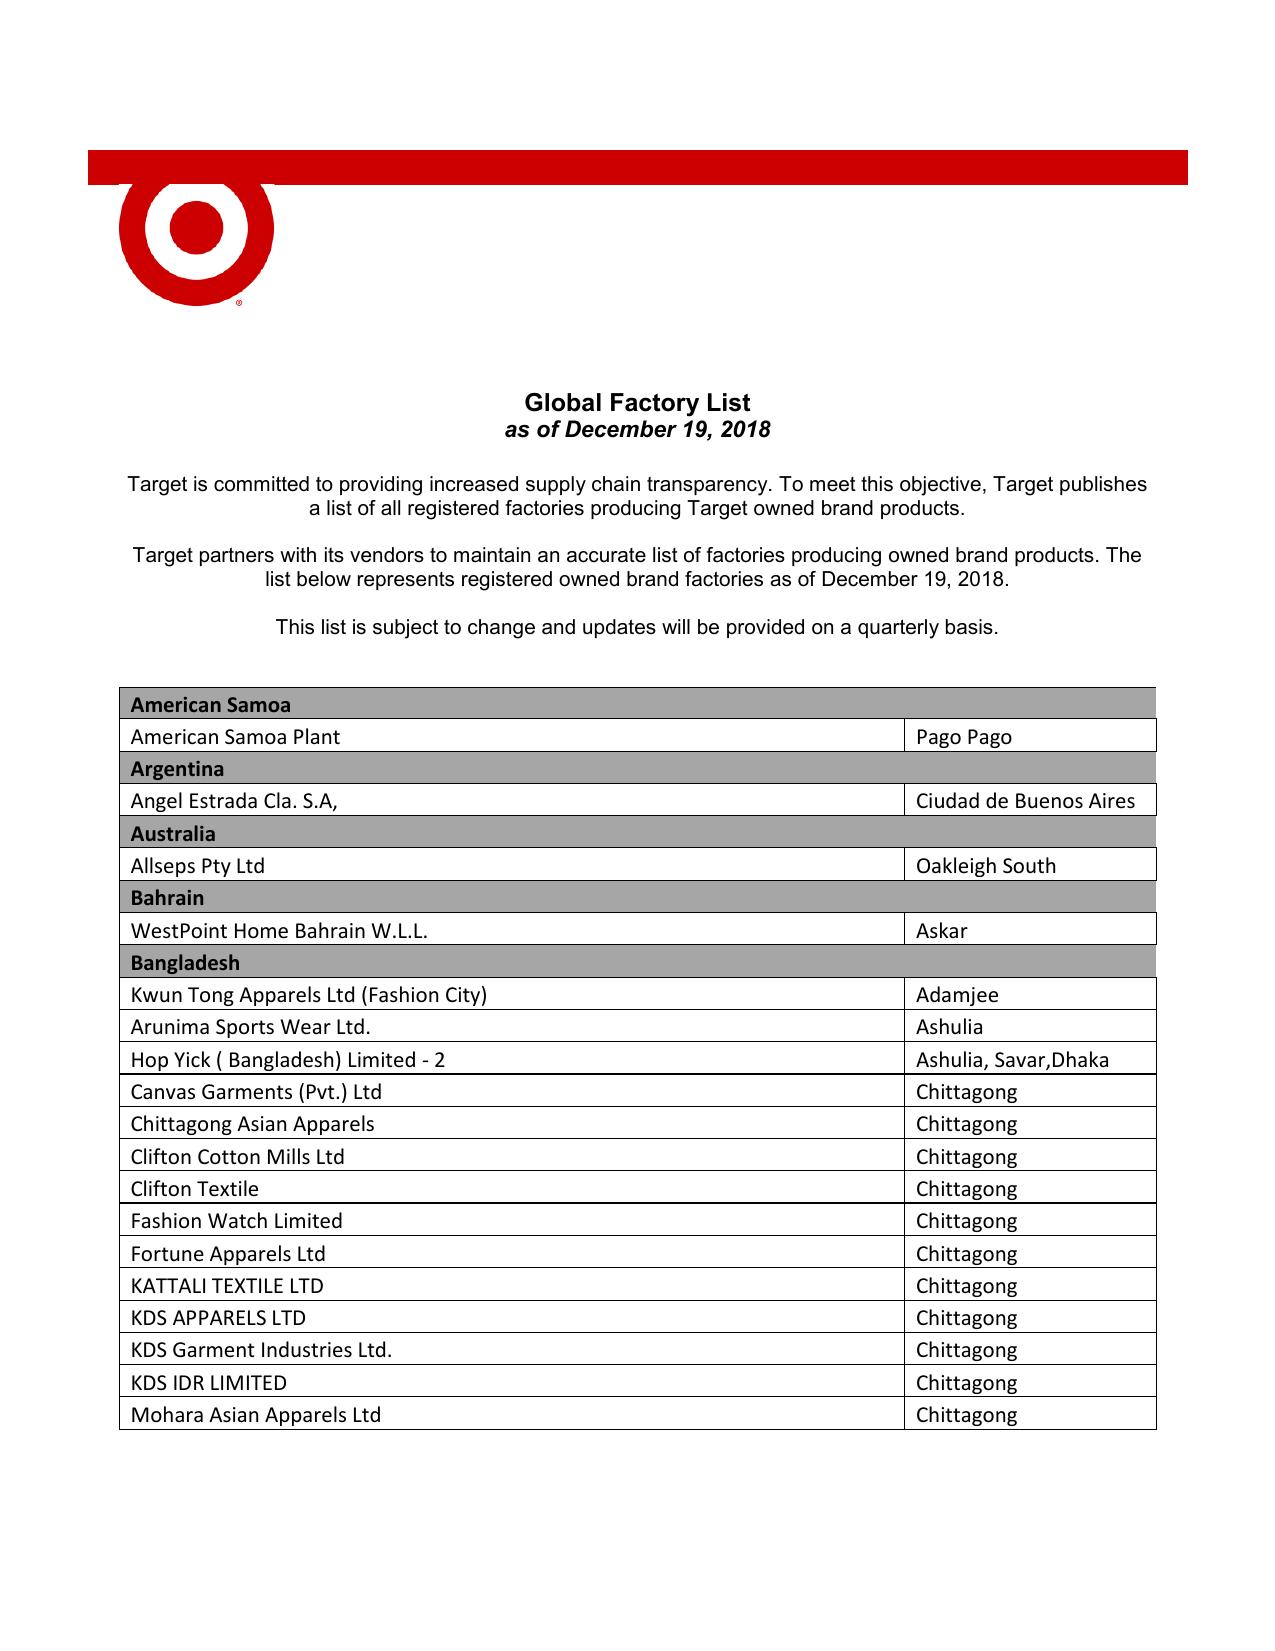 Target-Global-Factory-List Q4 2018